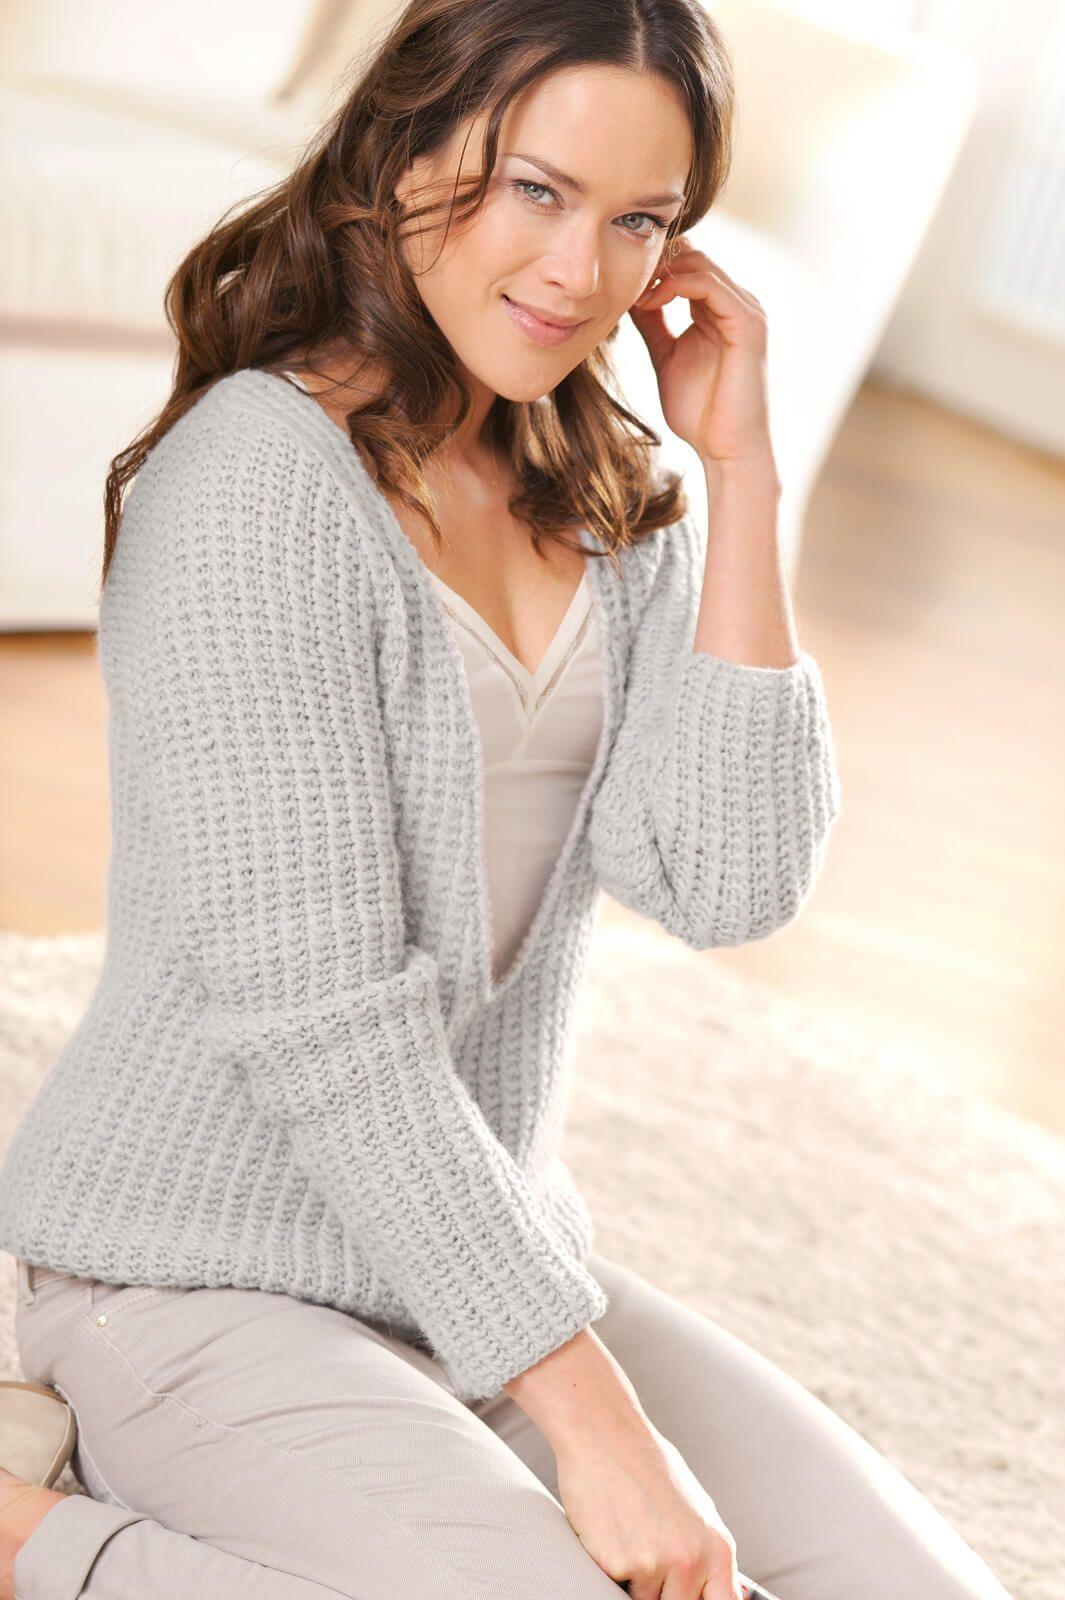 Damen-Pullover mit V-Ausschnitt | Pinterest | Pullover ...